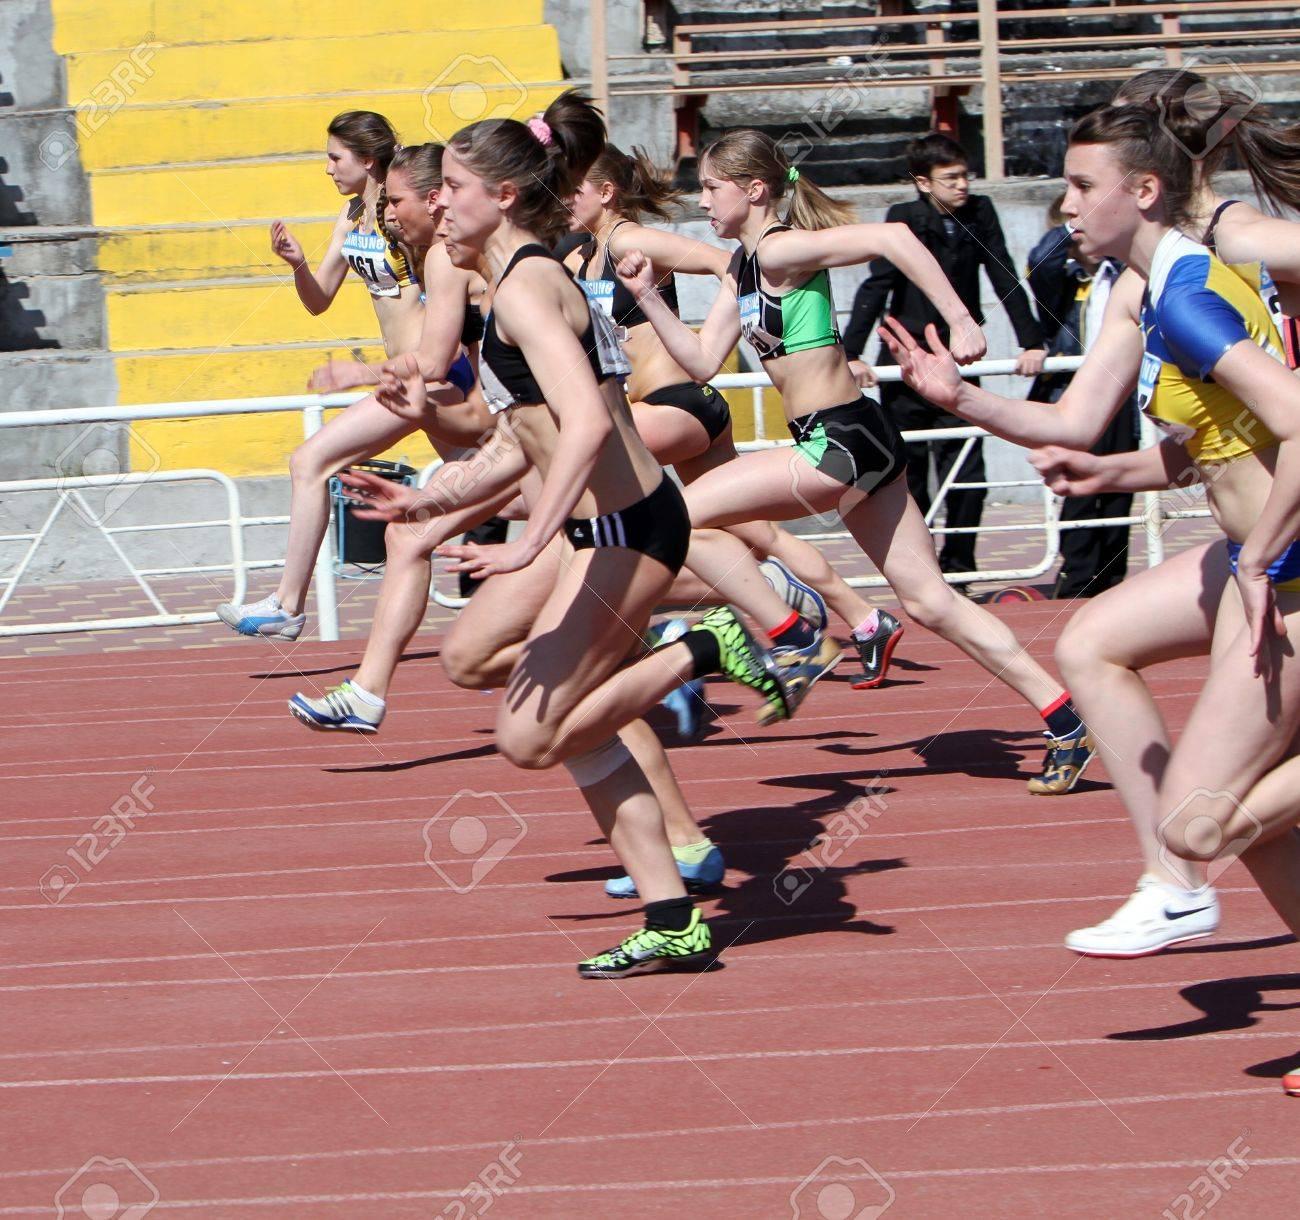 YALTA, UKRAINE - APRIL 25  Unidentified girls age 16-17 on the 100 meters race on Ukrainian Junior Track and Field Championships on April 25, 2012 in Yalta, Ukraine   Stock Photo - 13373062